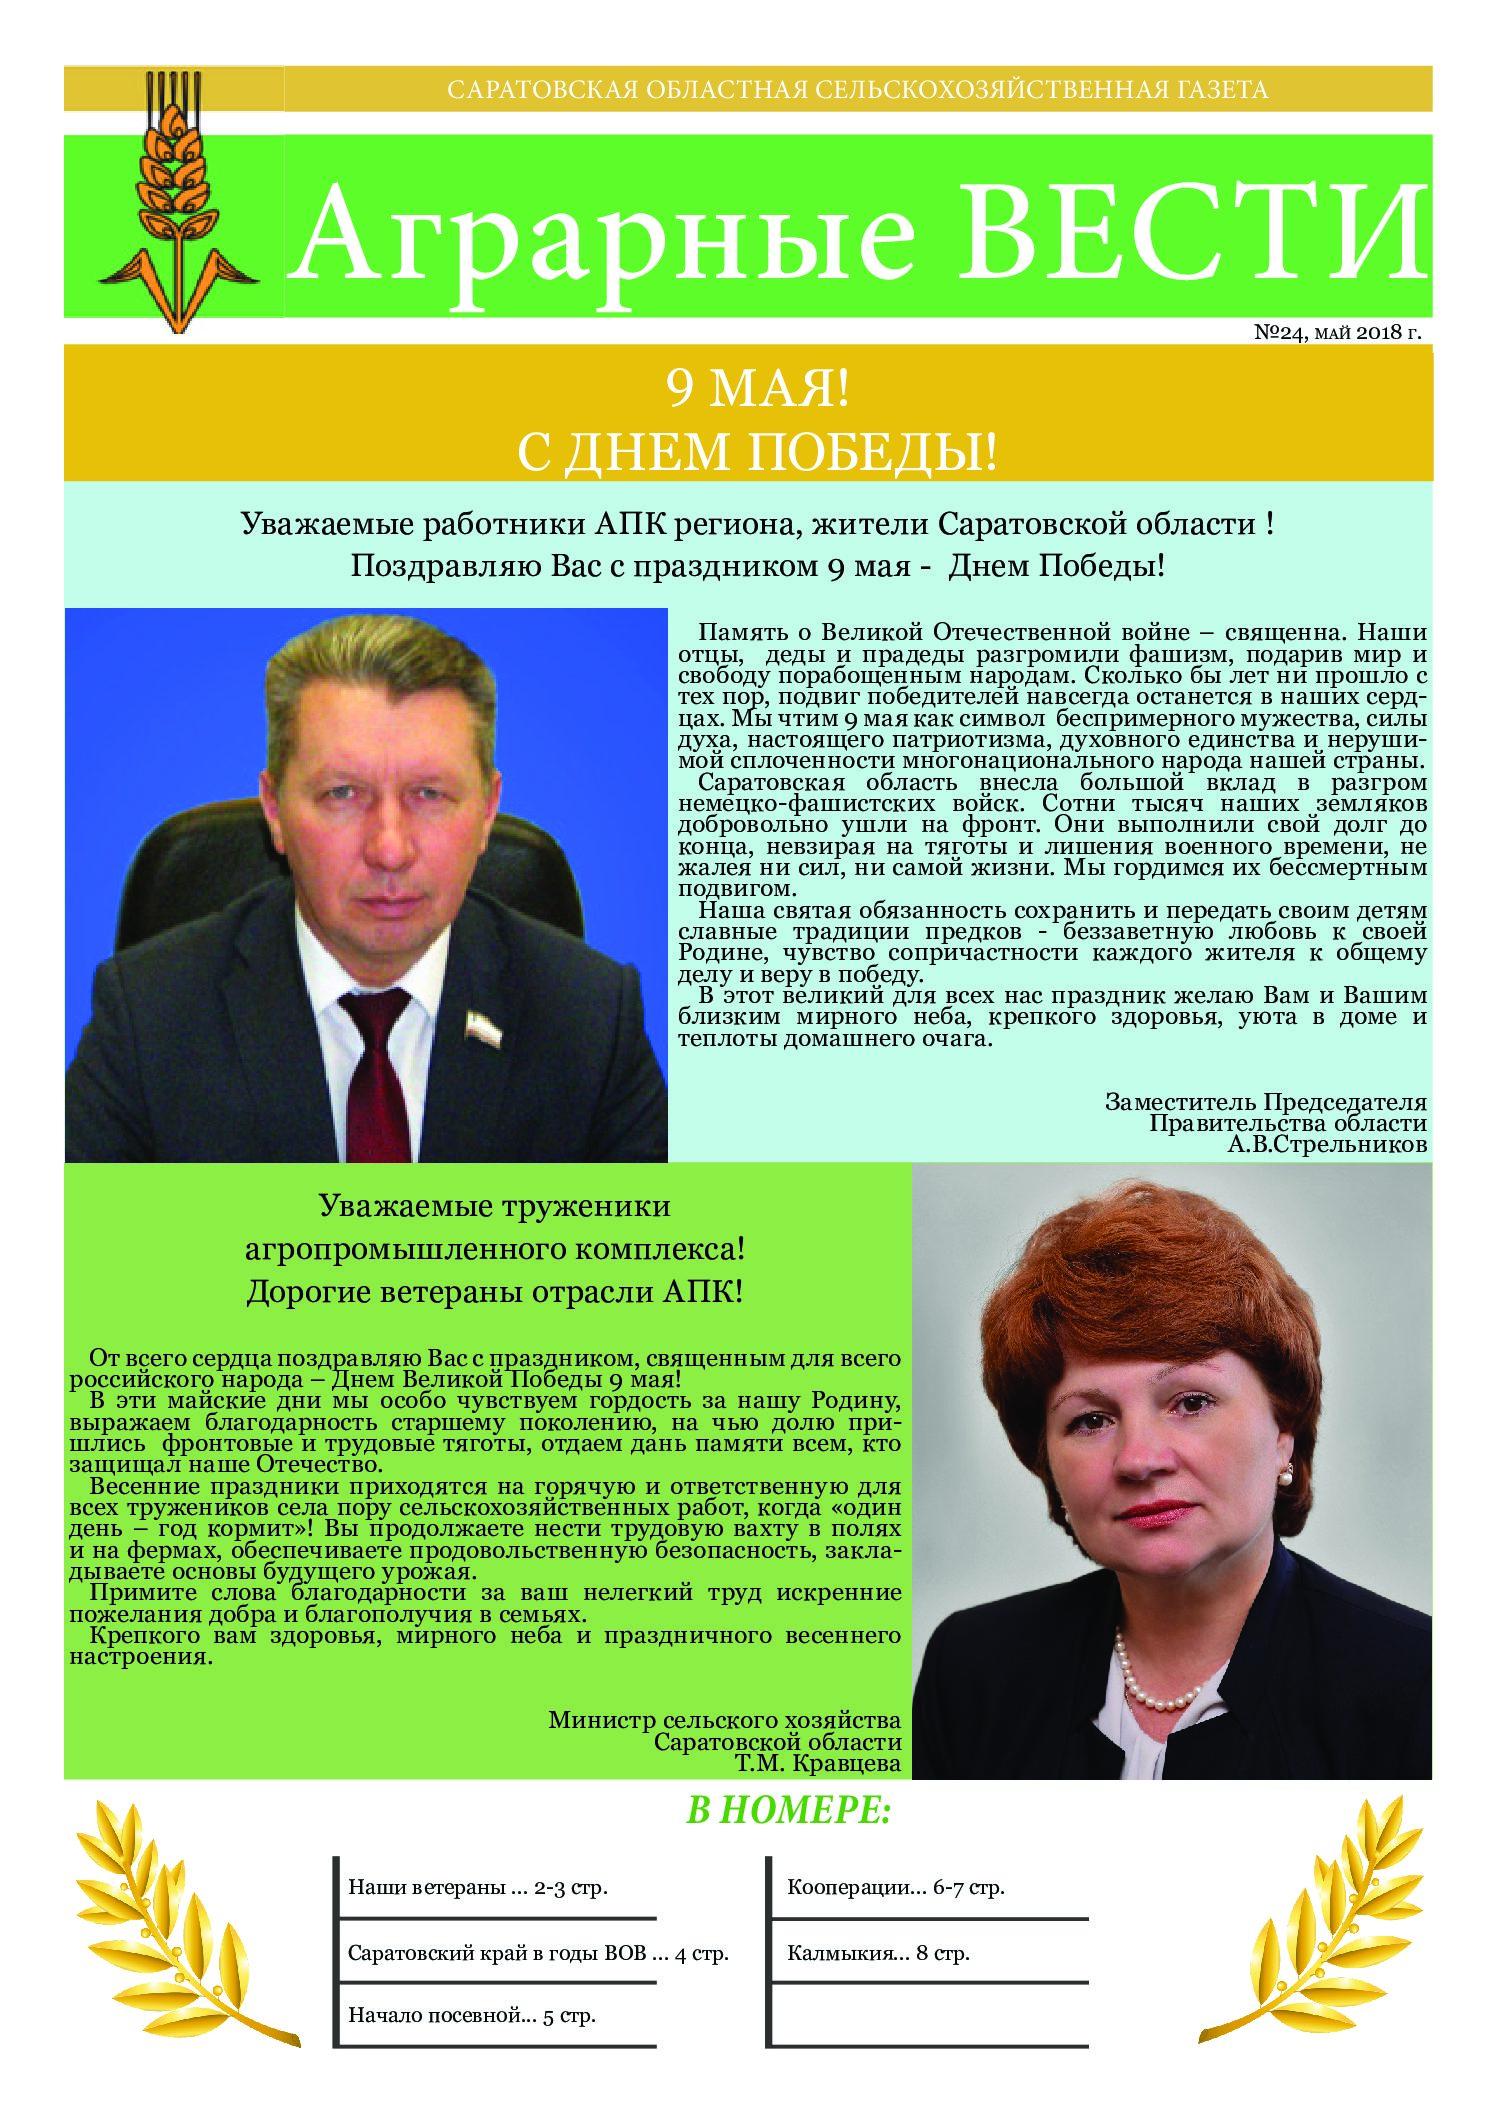 https://saratovagro.ru/wp-content/uploads/2020/08/3.2018-pdf.jpg